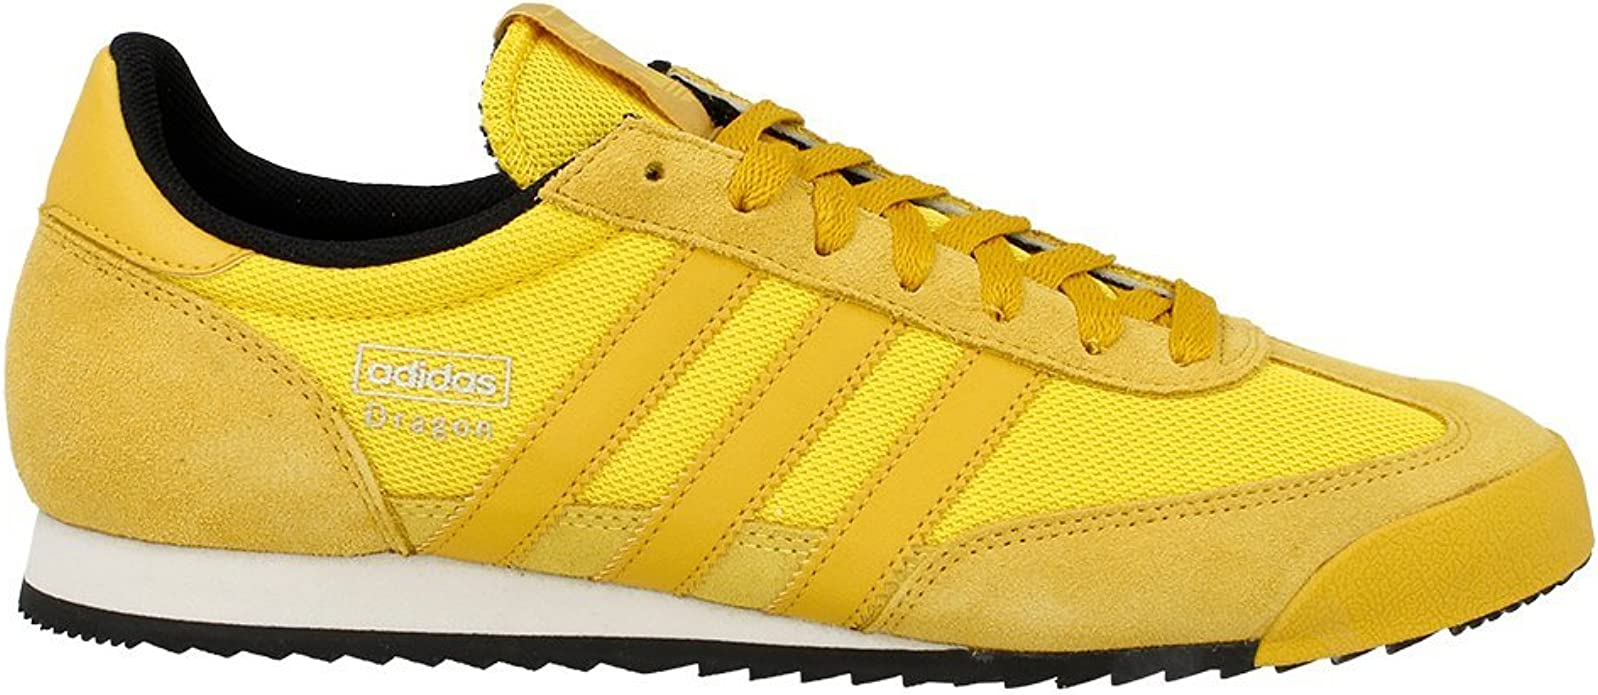 adidas Originals Dragon de Mens Trainers Jaune D65546, Size:46 ...